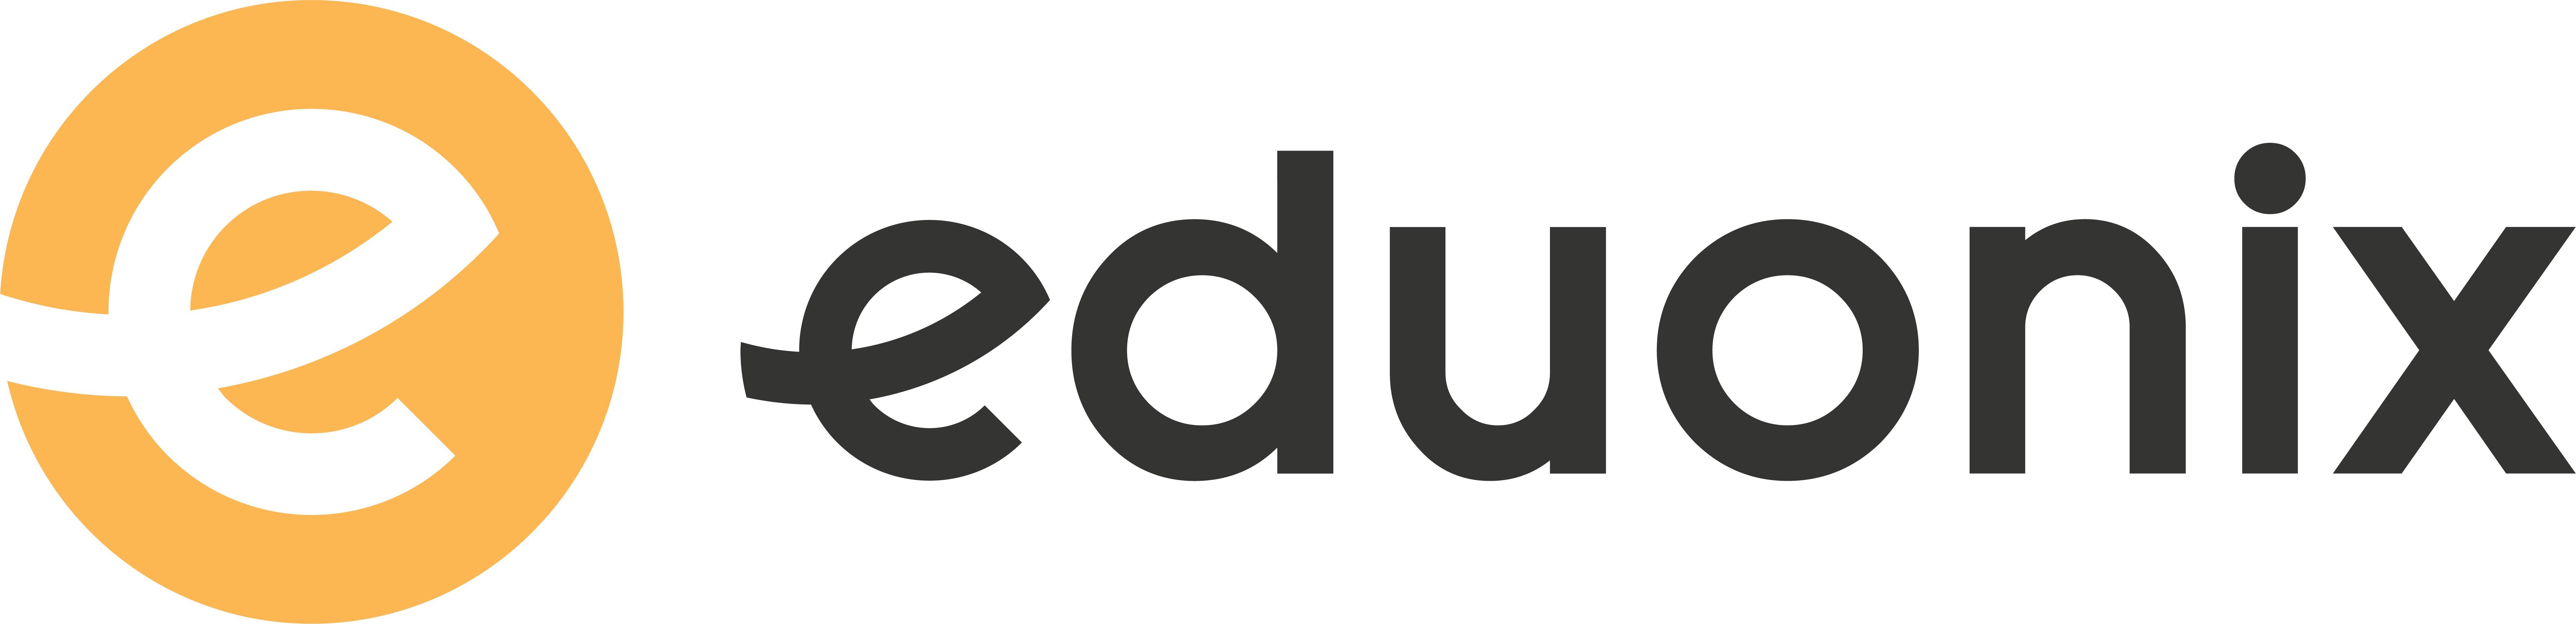 EDUONIX | LinkedIn